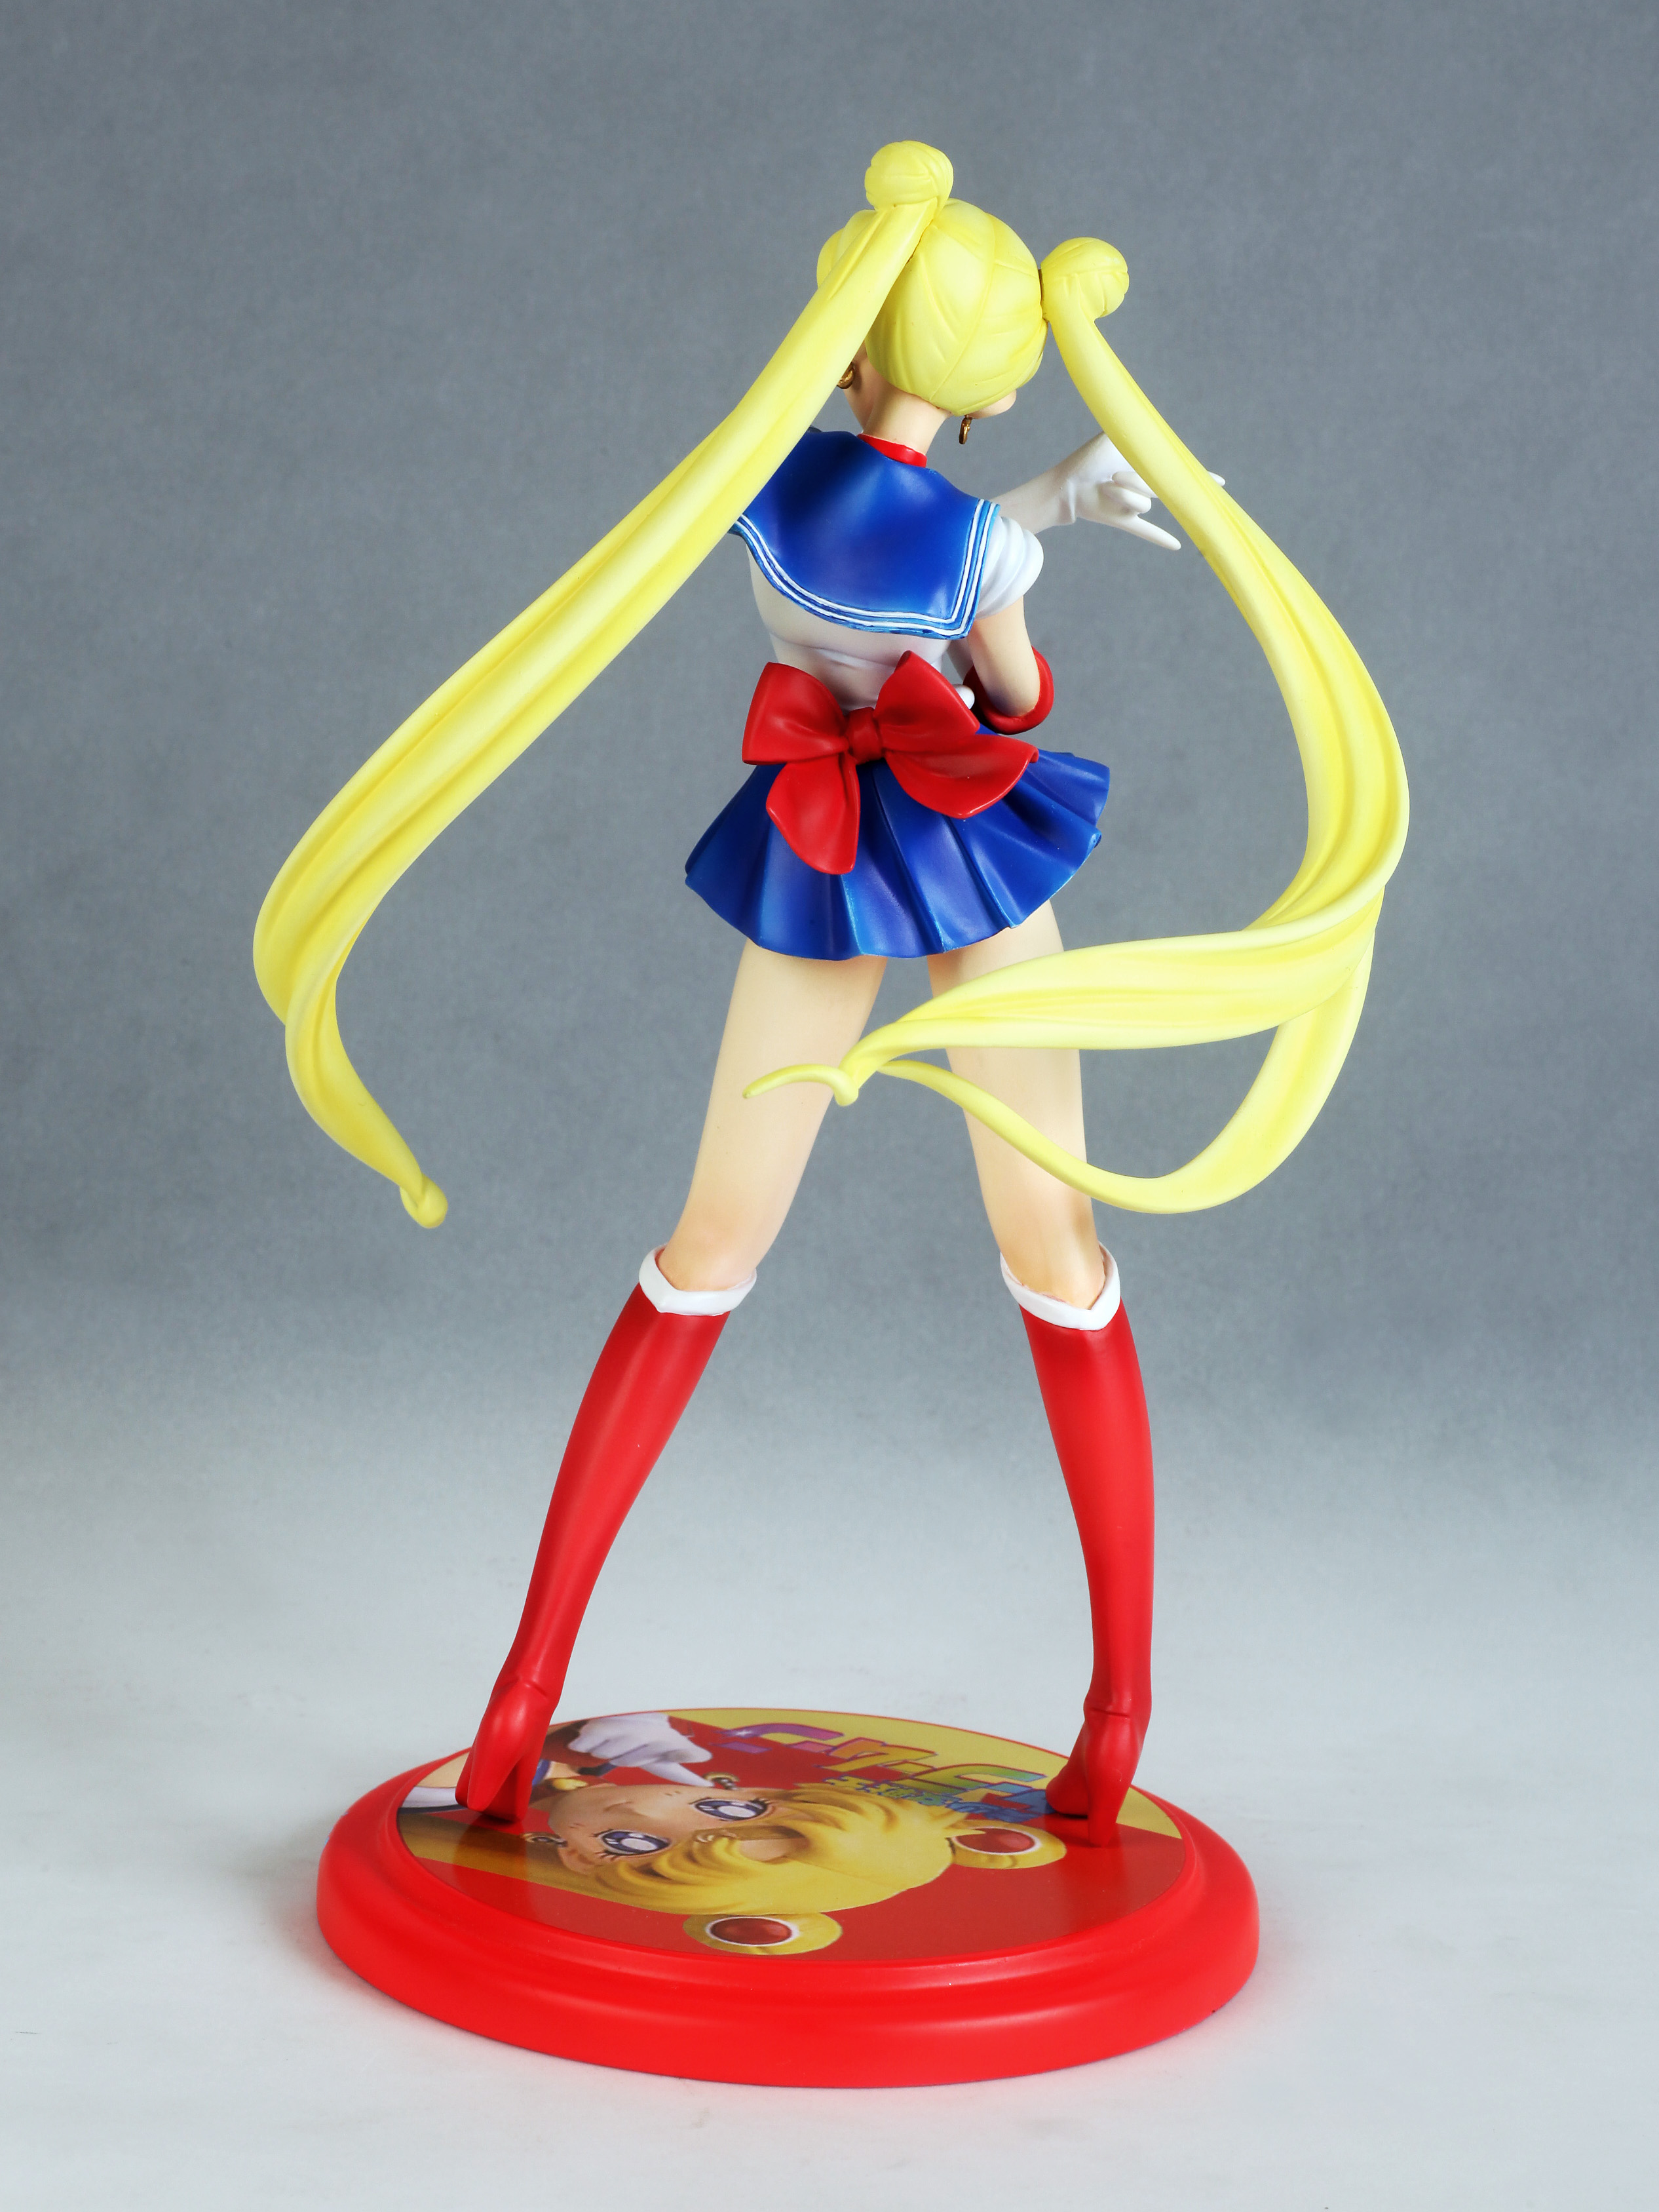 Sailor Moon Usagi Tsukino prepainted figure haruhichan.com Sailor Moon Anime figure 01